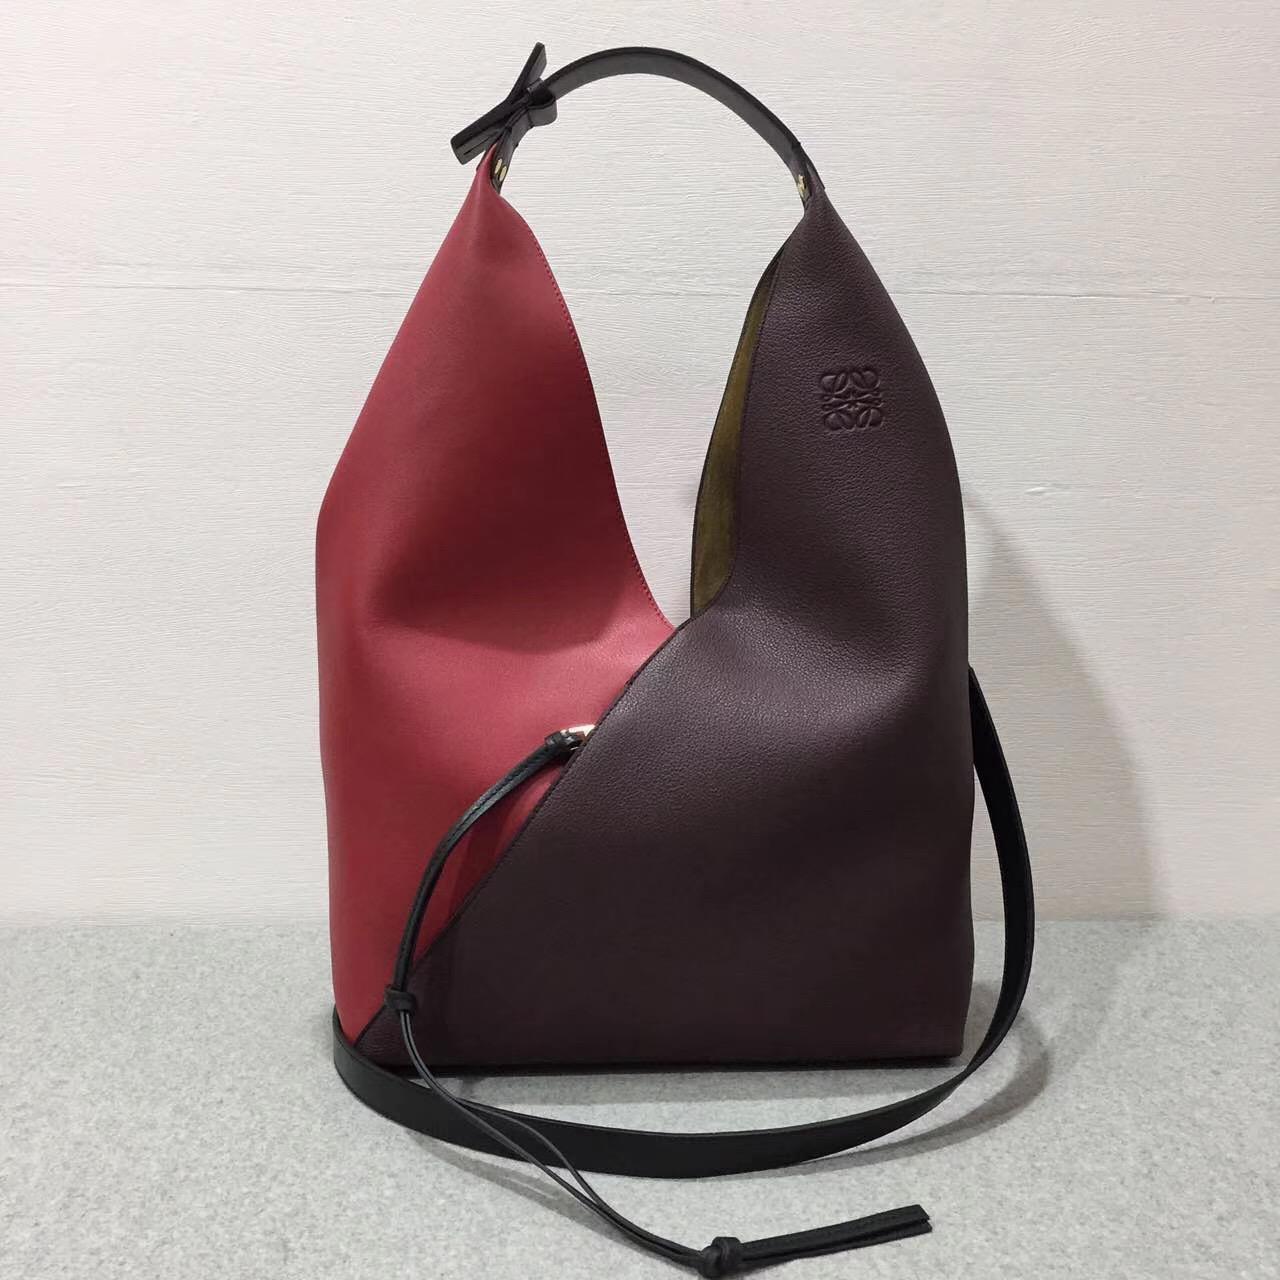 LOEWE Sling shoulder bag/Barneys New York,Colorblock Sling Grain Bucket Bag